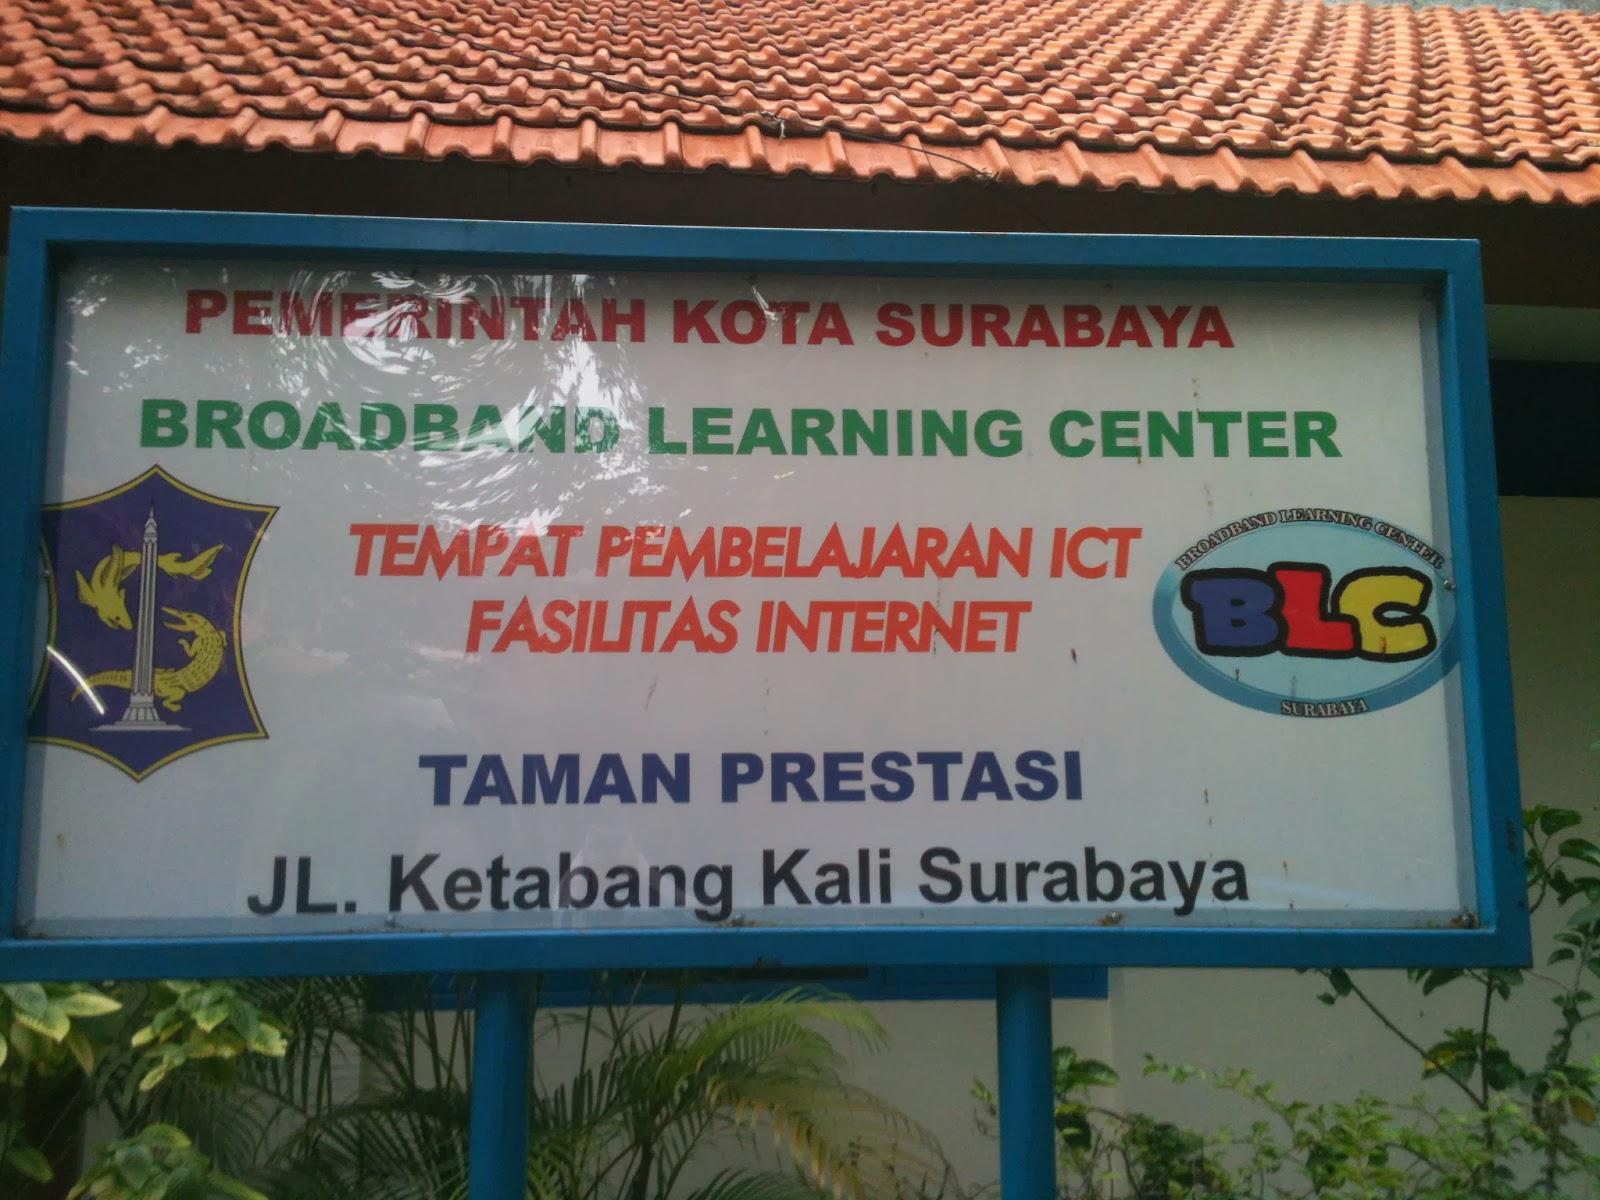 Taman Prestasi Wisata Murah Meriah Surabaya Kecamatan Berprestasi Blcsurabaya Blogspot